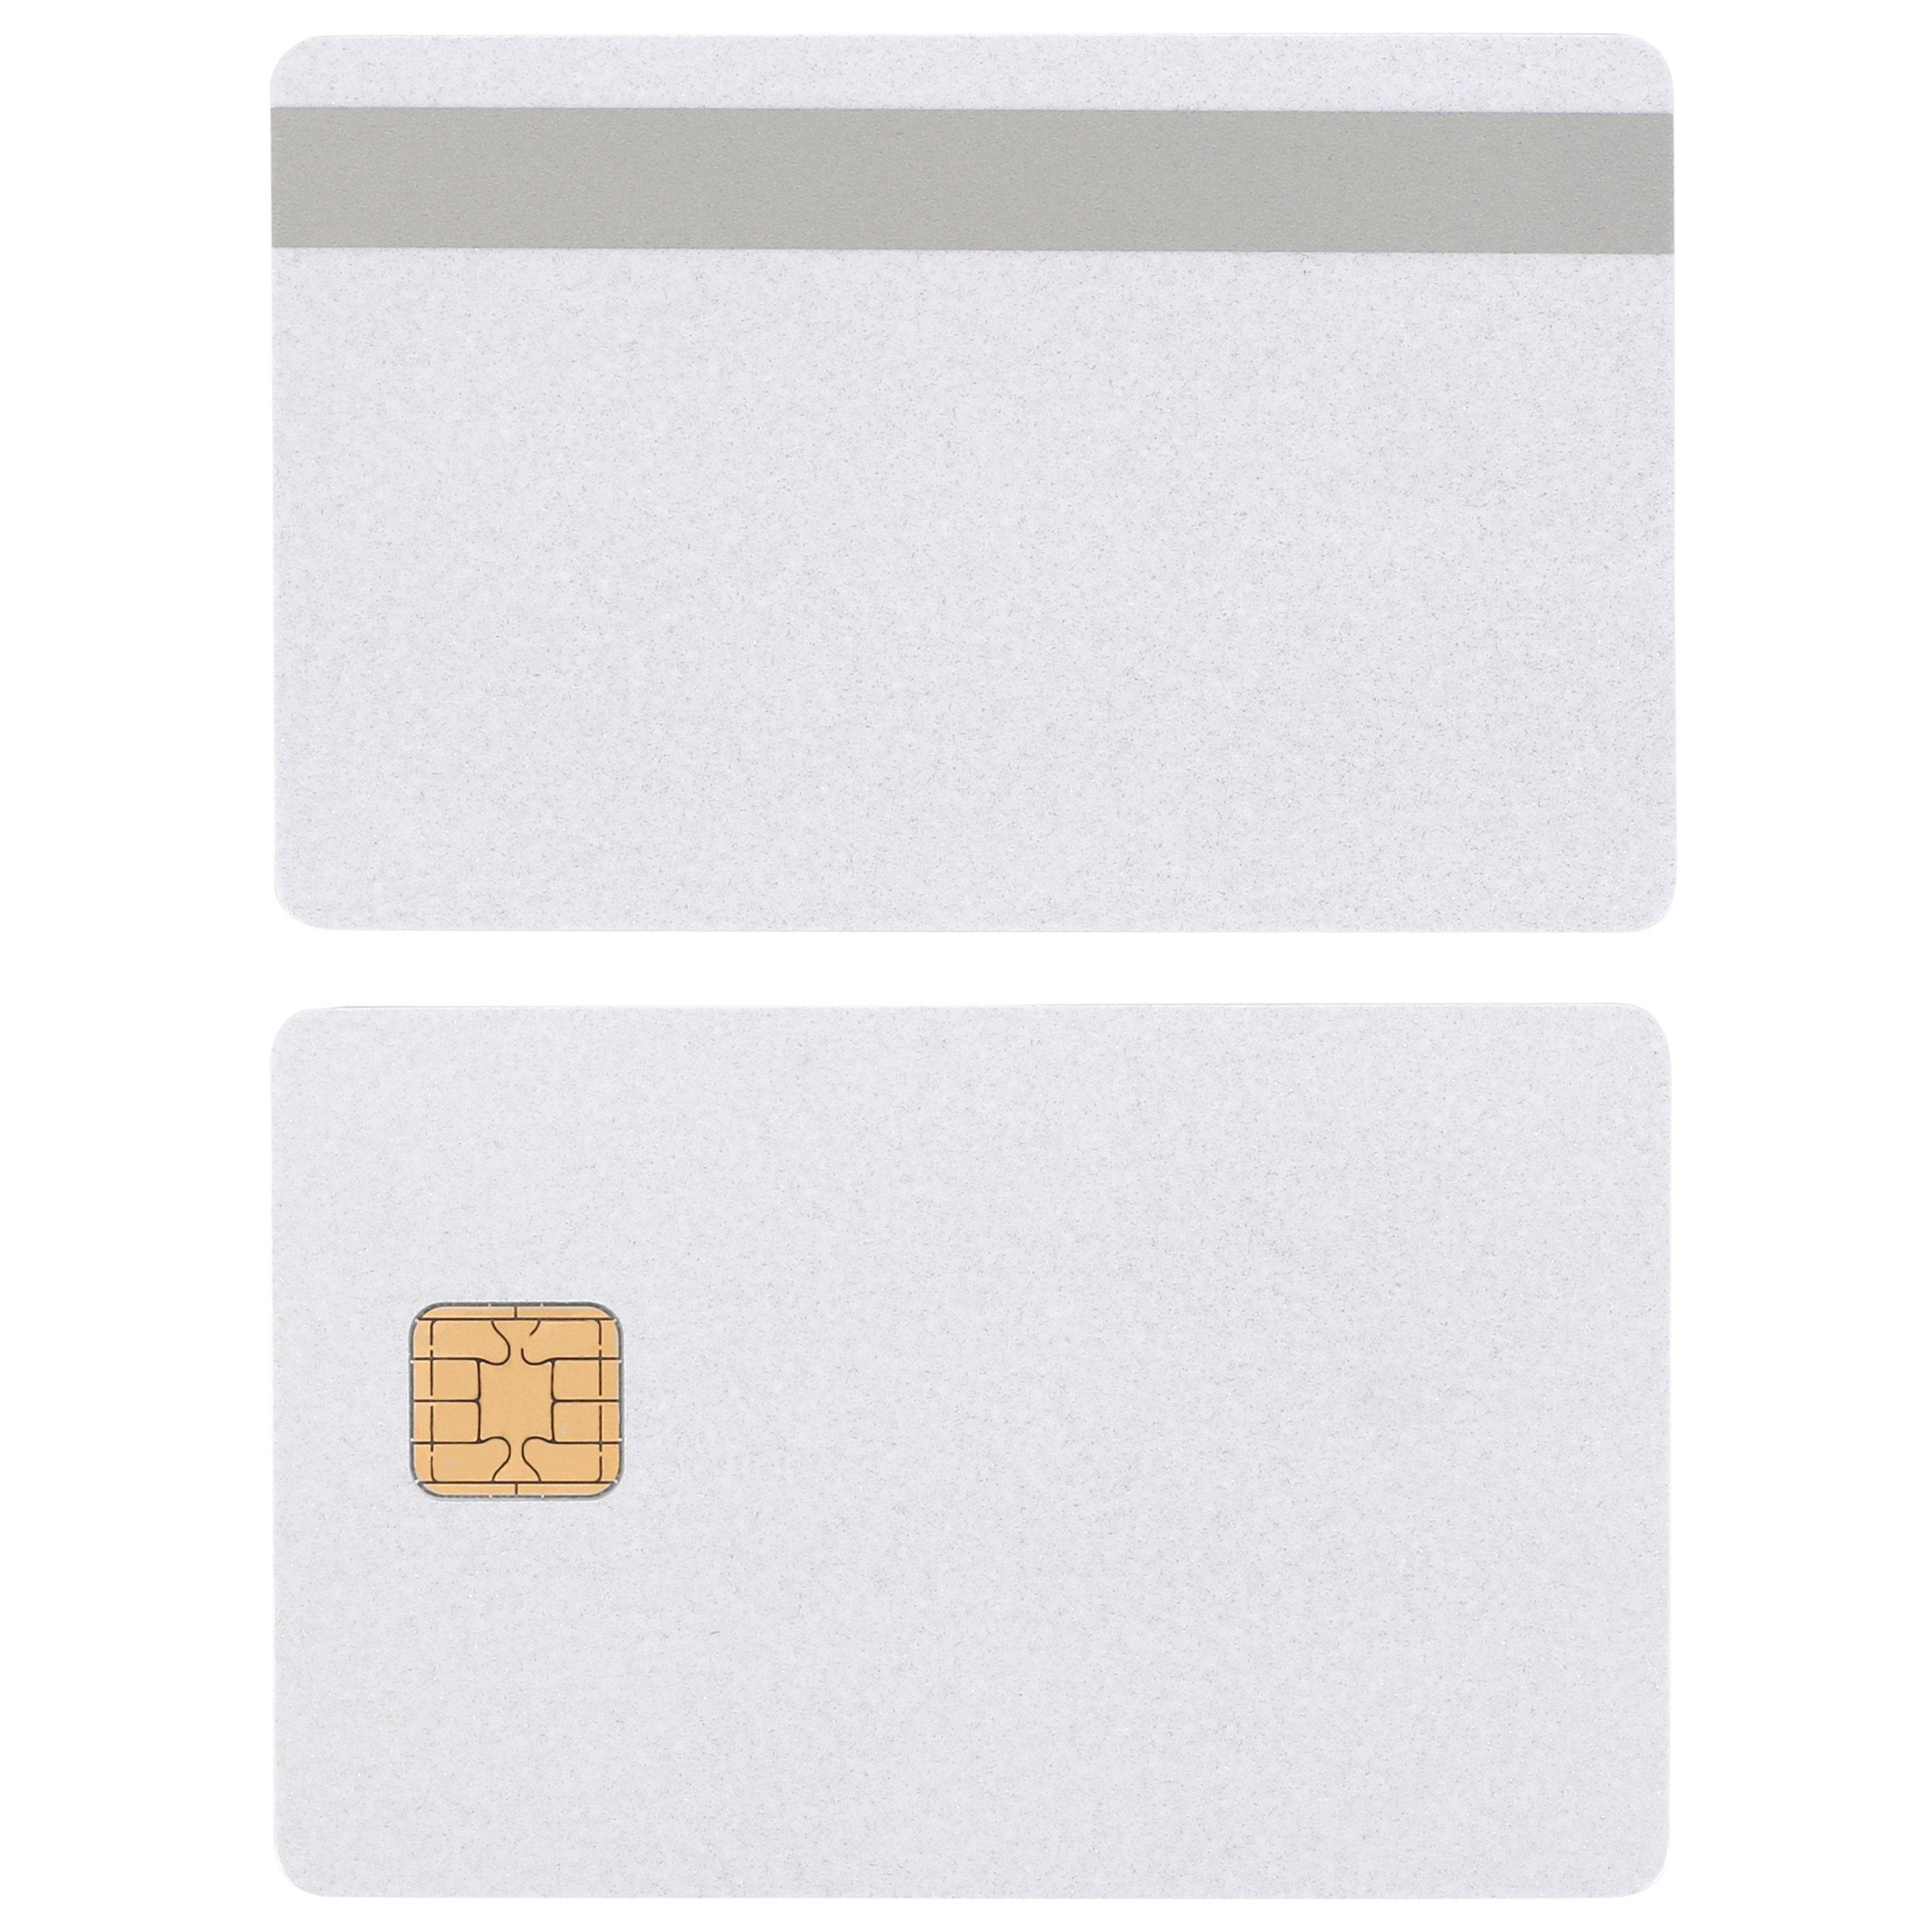 J2A040 Java JCOP Chip Cards PEARL w/ HiCo SILVER 2 Track Mag Stripe JCOP21-36K - 400 Pack by badgeDesigner